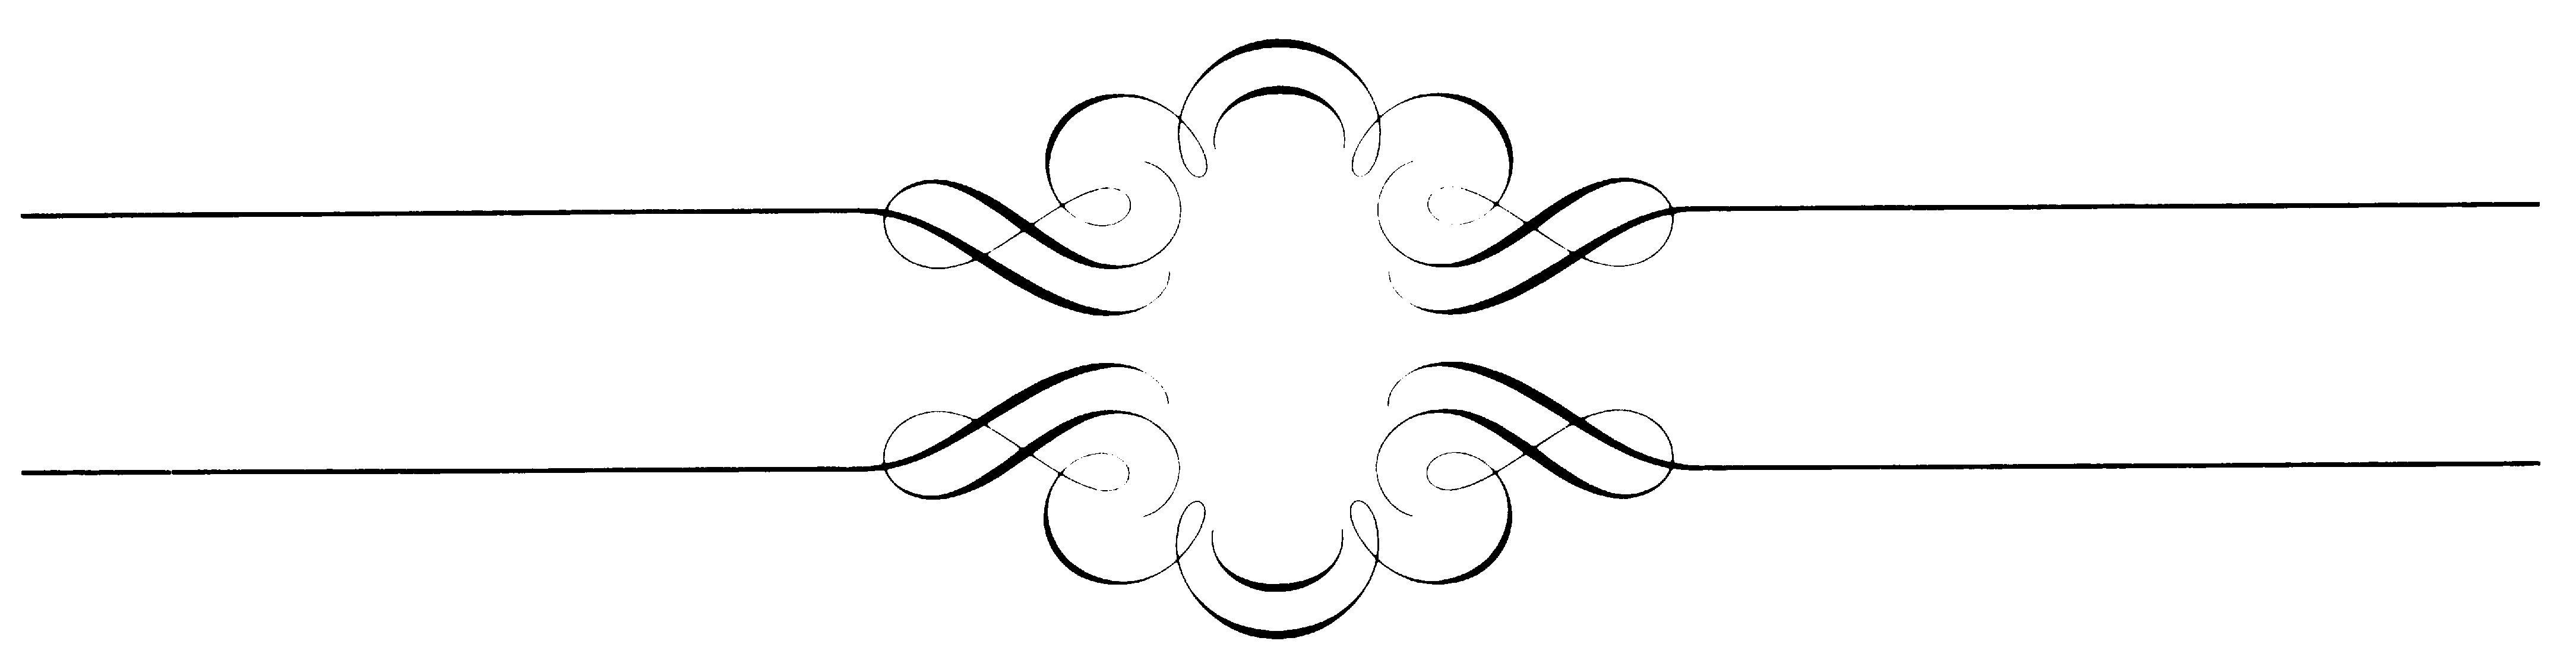 Free Elegant Lines Cliparts, Download Free Clip Art, Free.